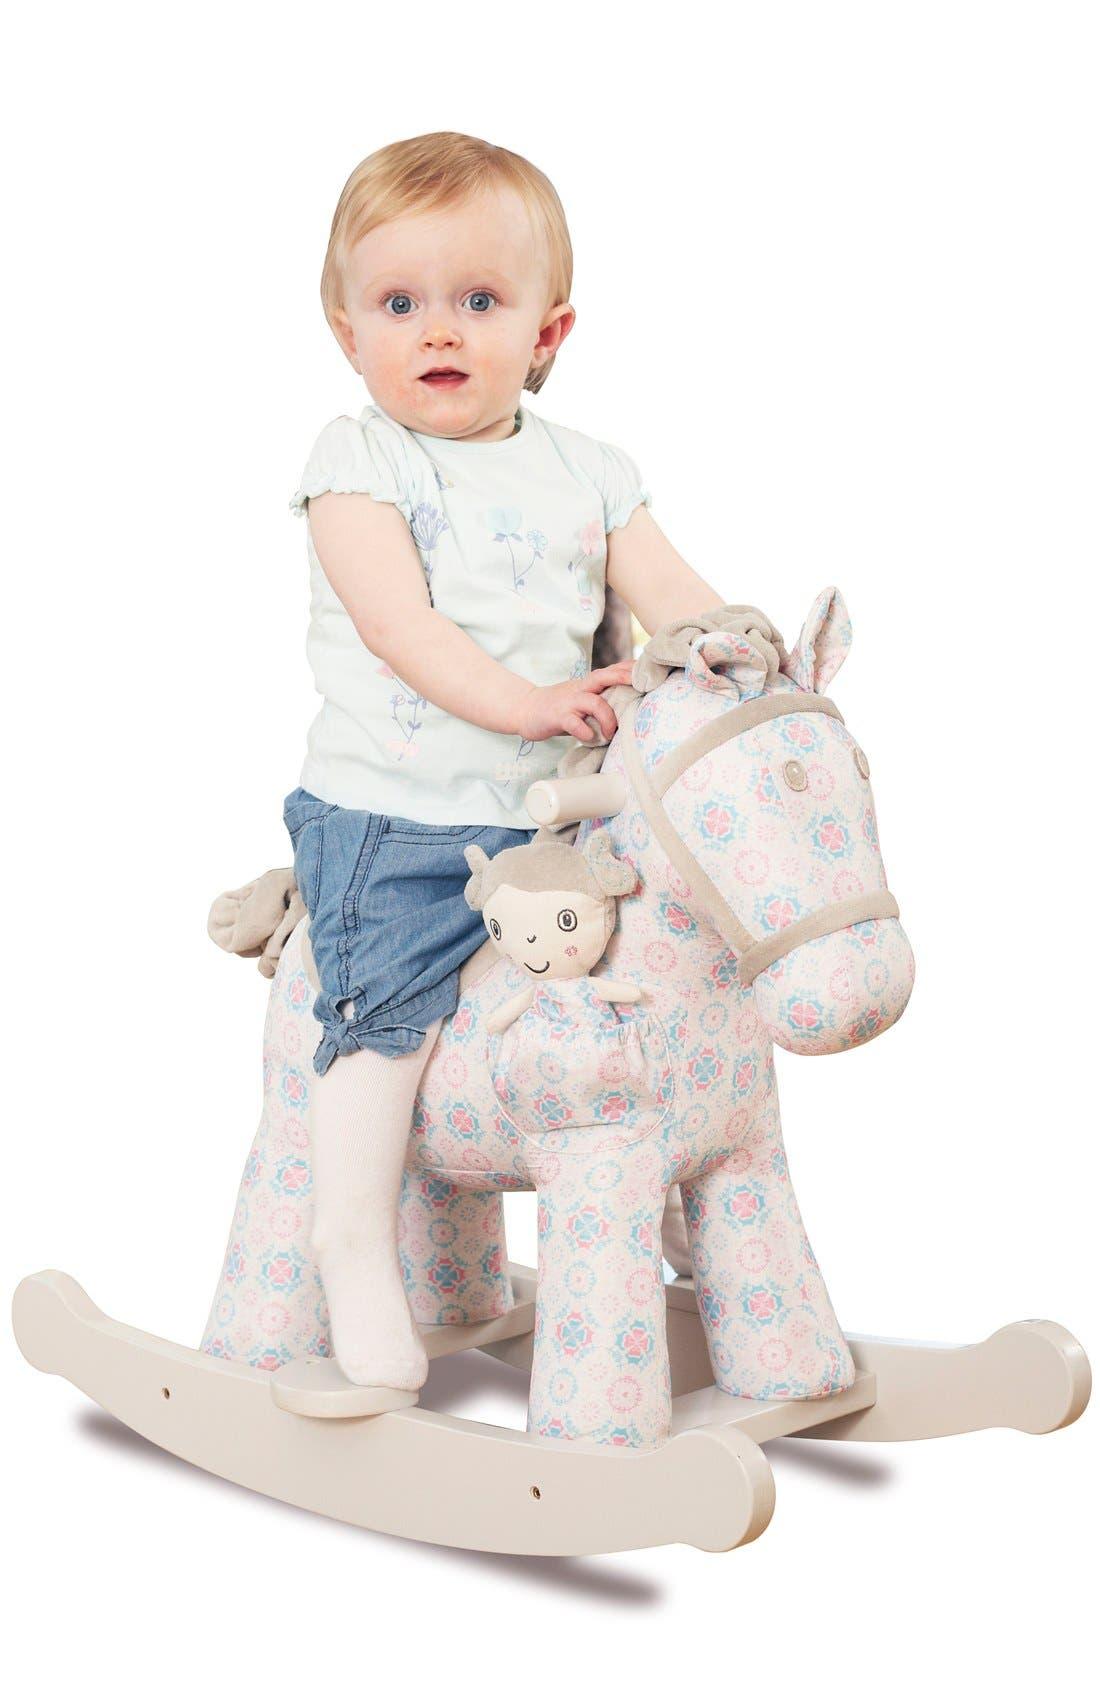 Rosie & Mae Rocking Horse & Stuffed Animal,                             Alternate thumbnail 2, color,                             Pink